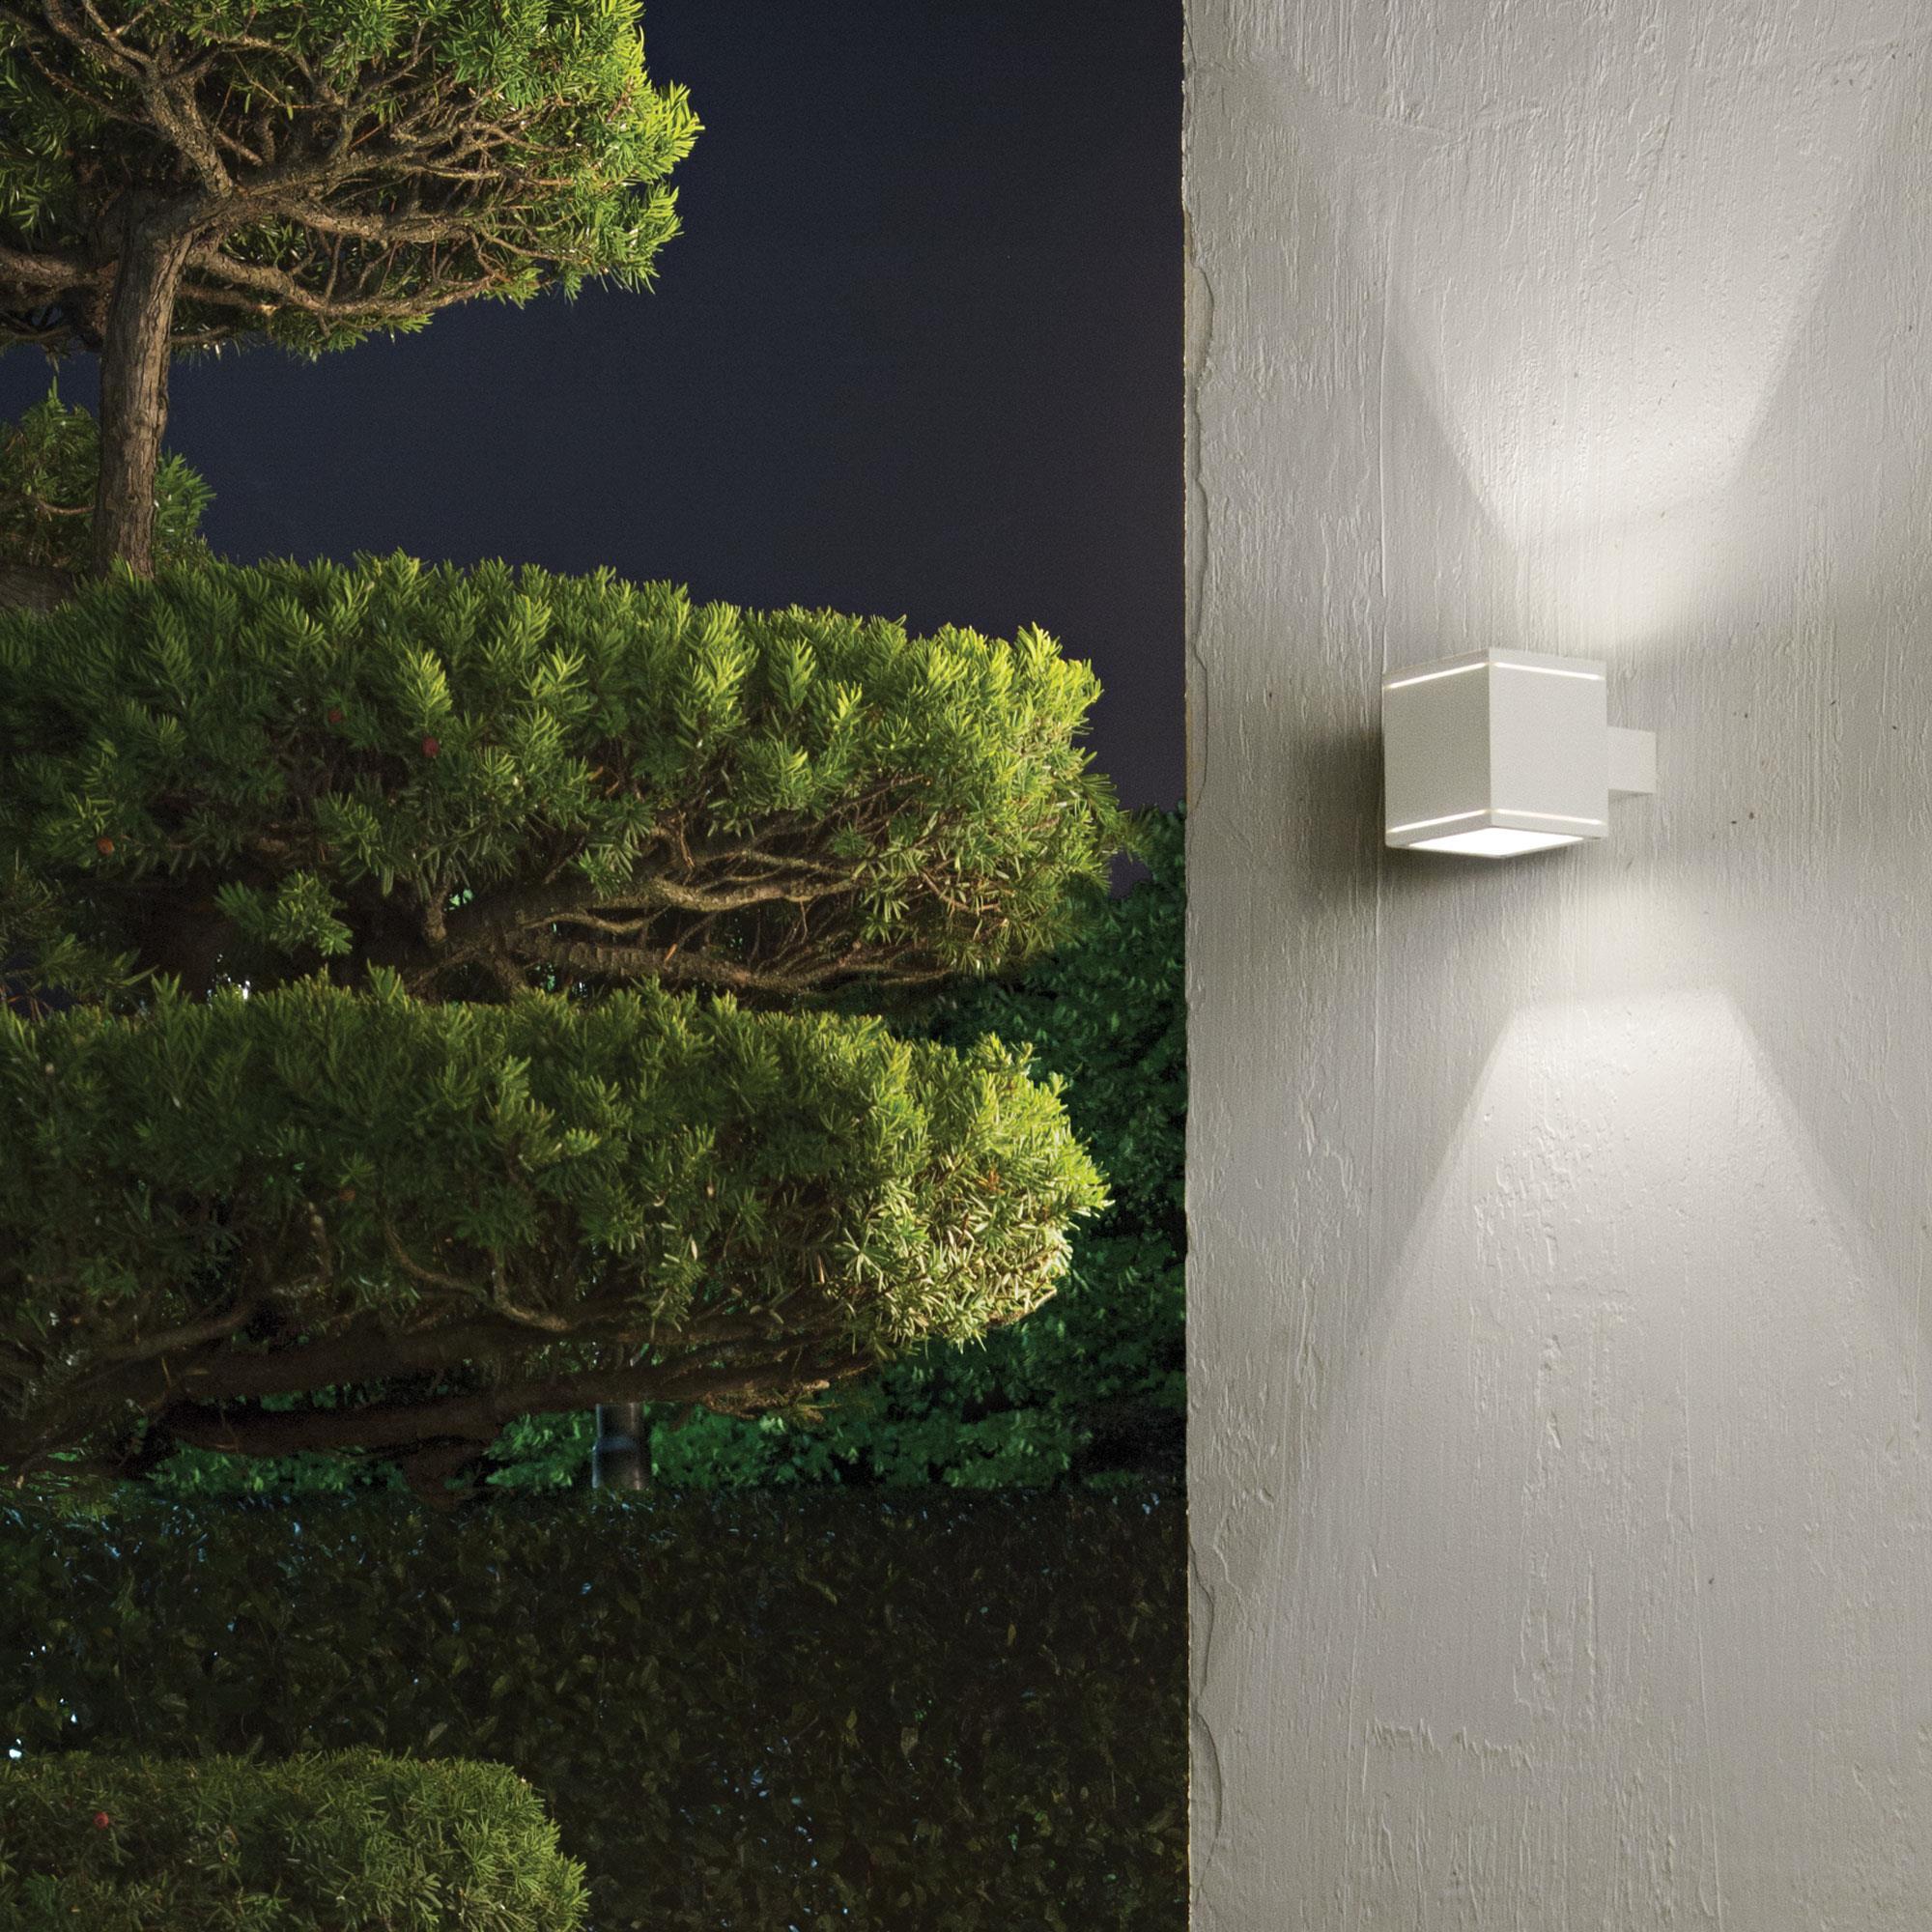 Ideal Lux 144276 Snif AP1 Square Bianco kültéri falilámpa